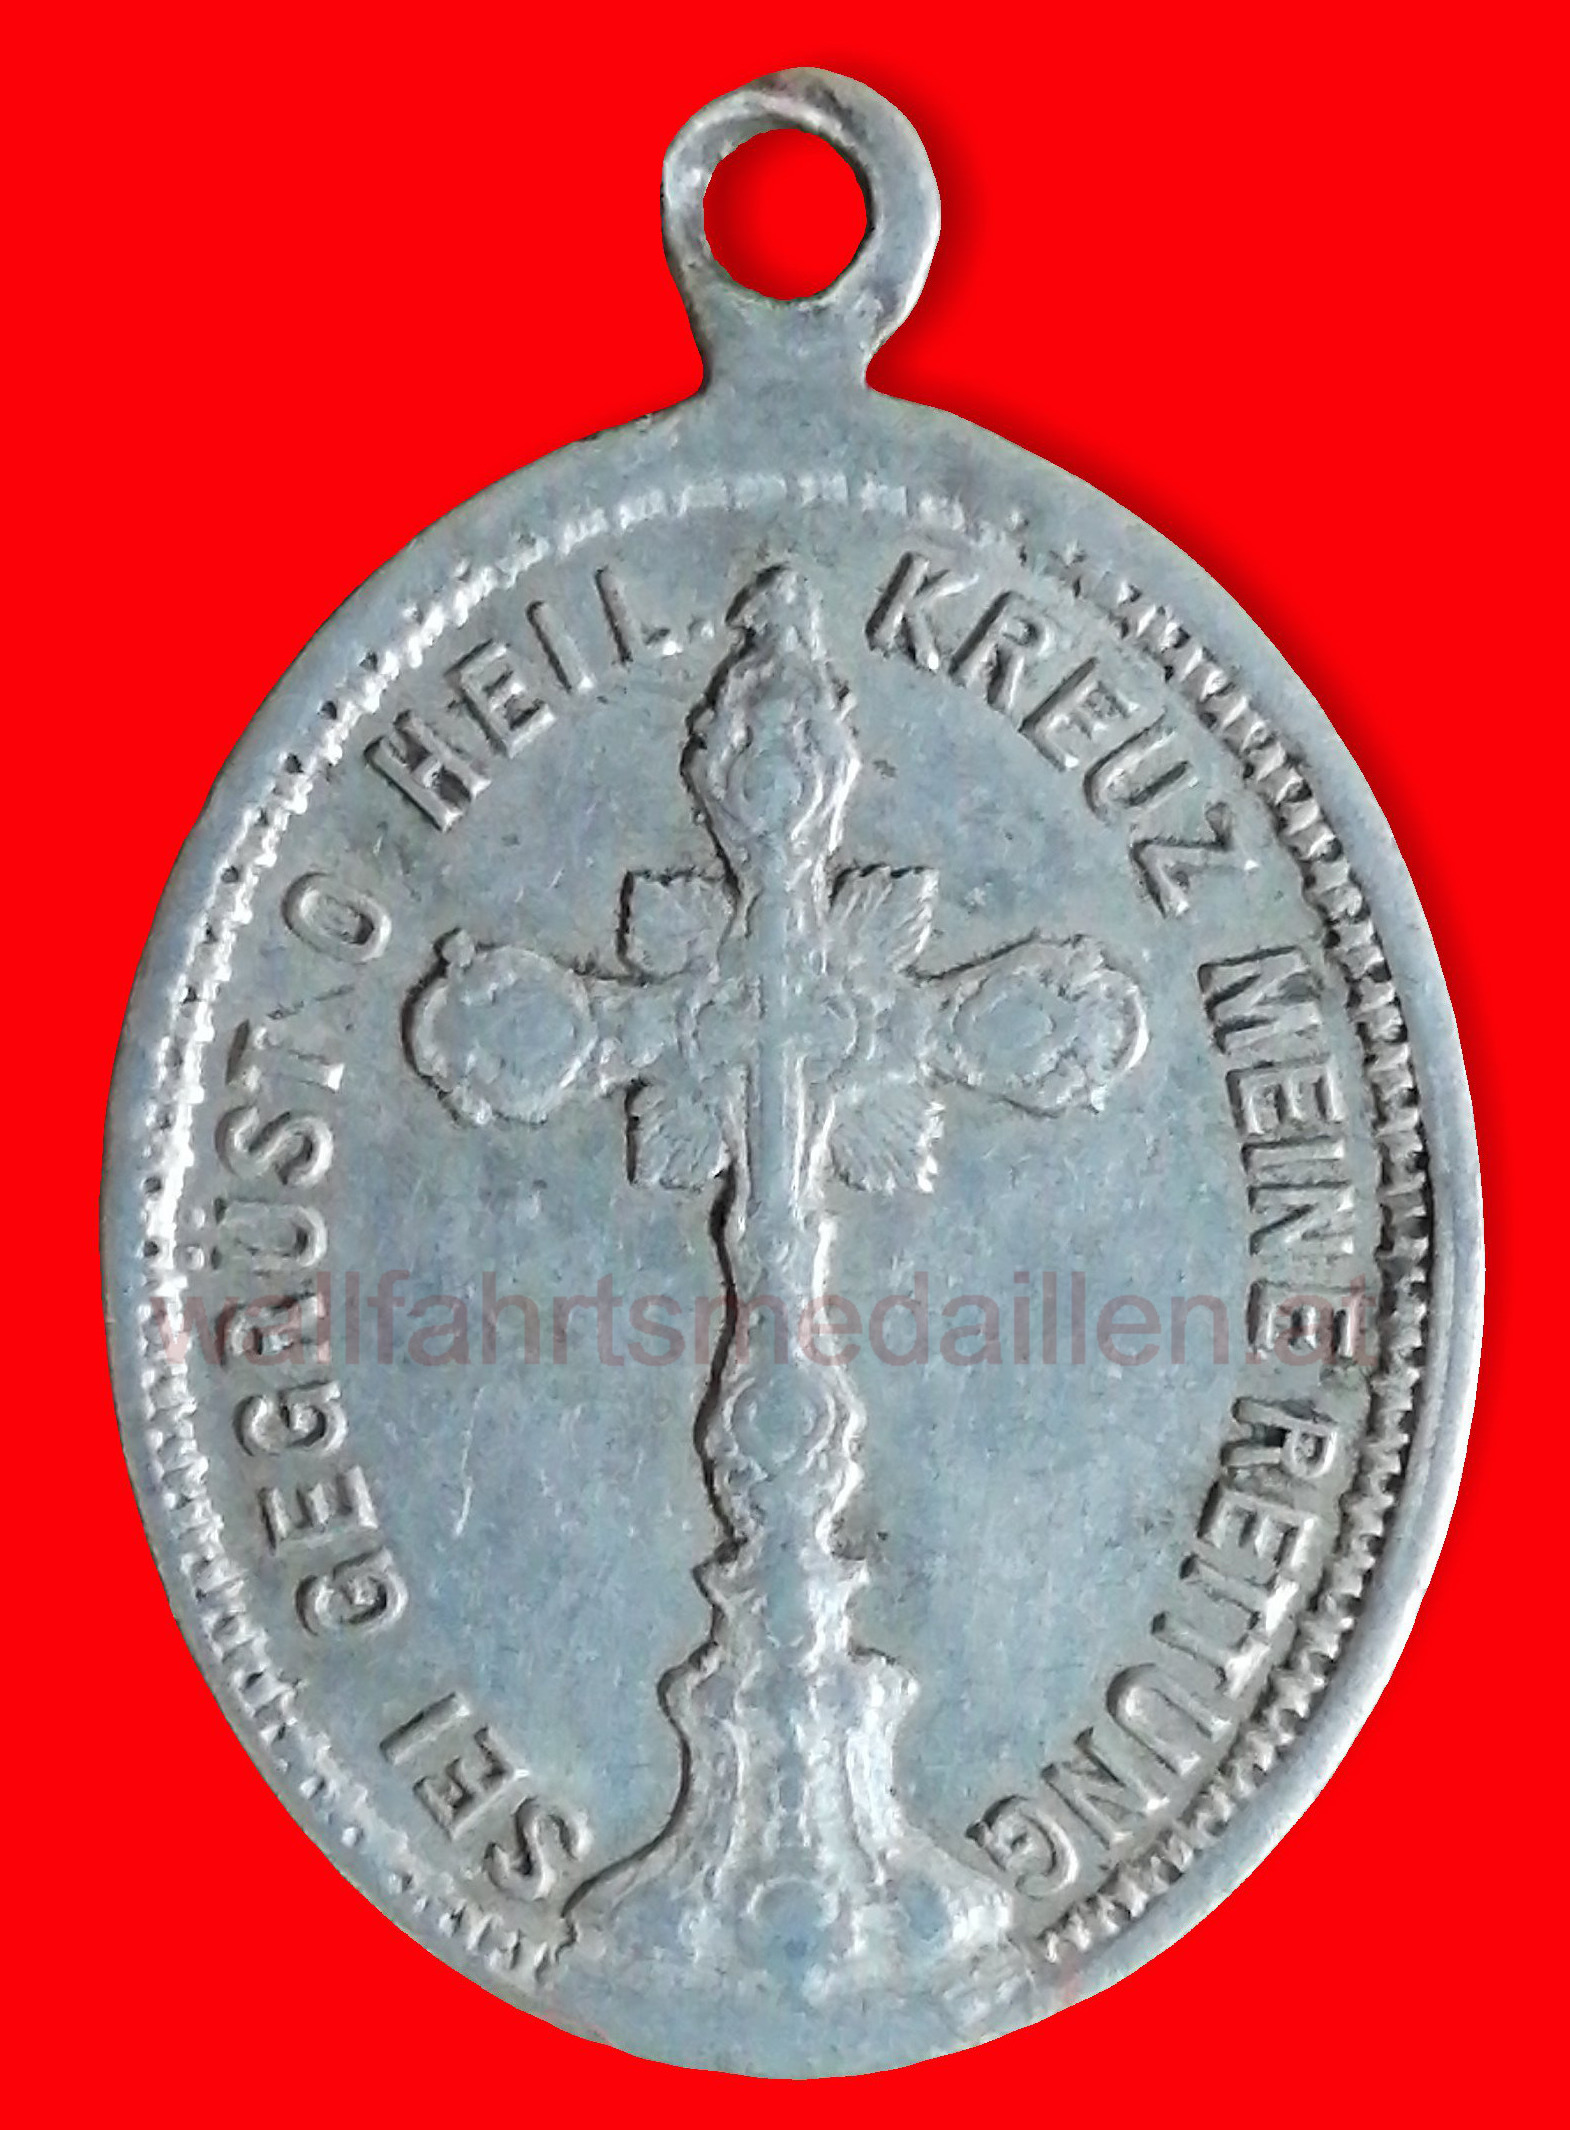 Wallfahrt Stift Heiligenkreuz